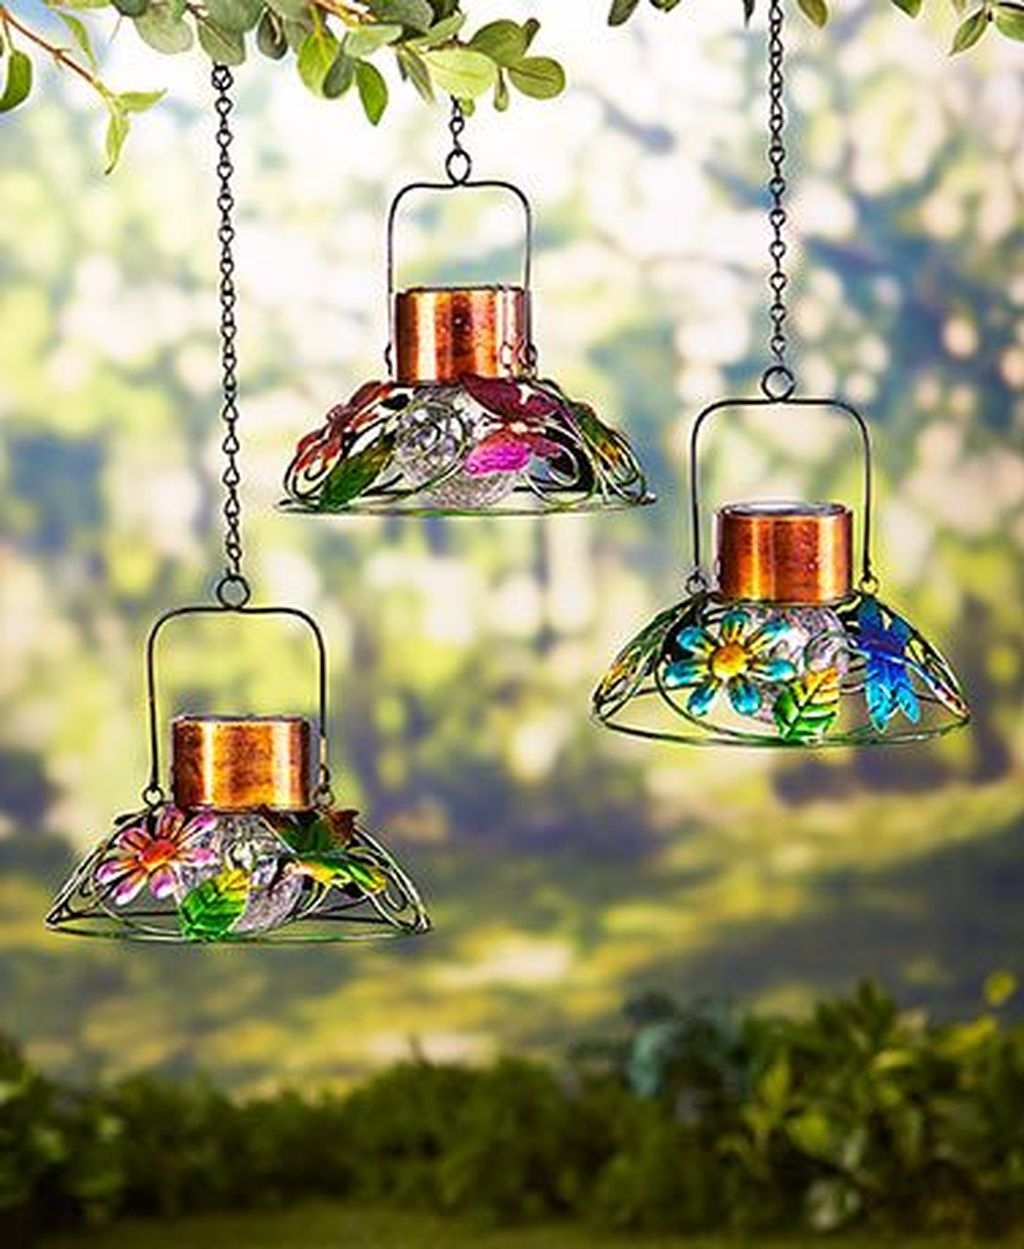 Inspiring Outdoor Lighting Ideas For Your Garden 25